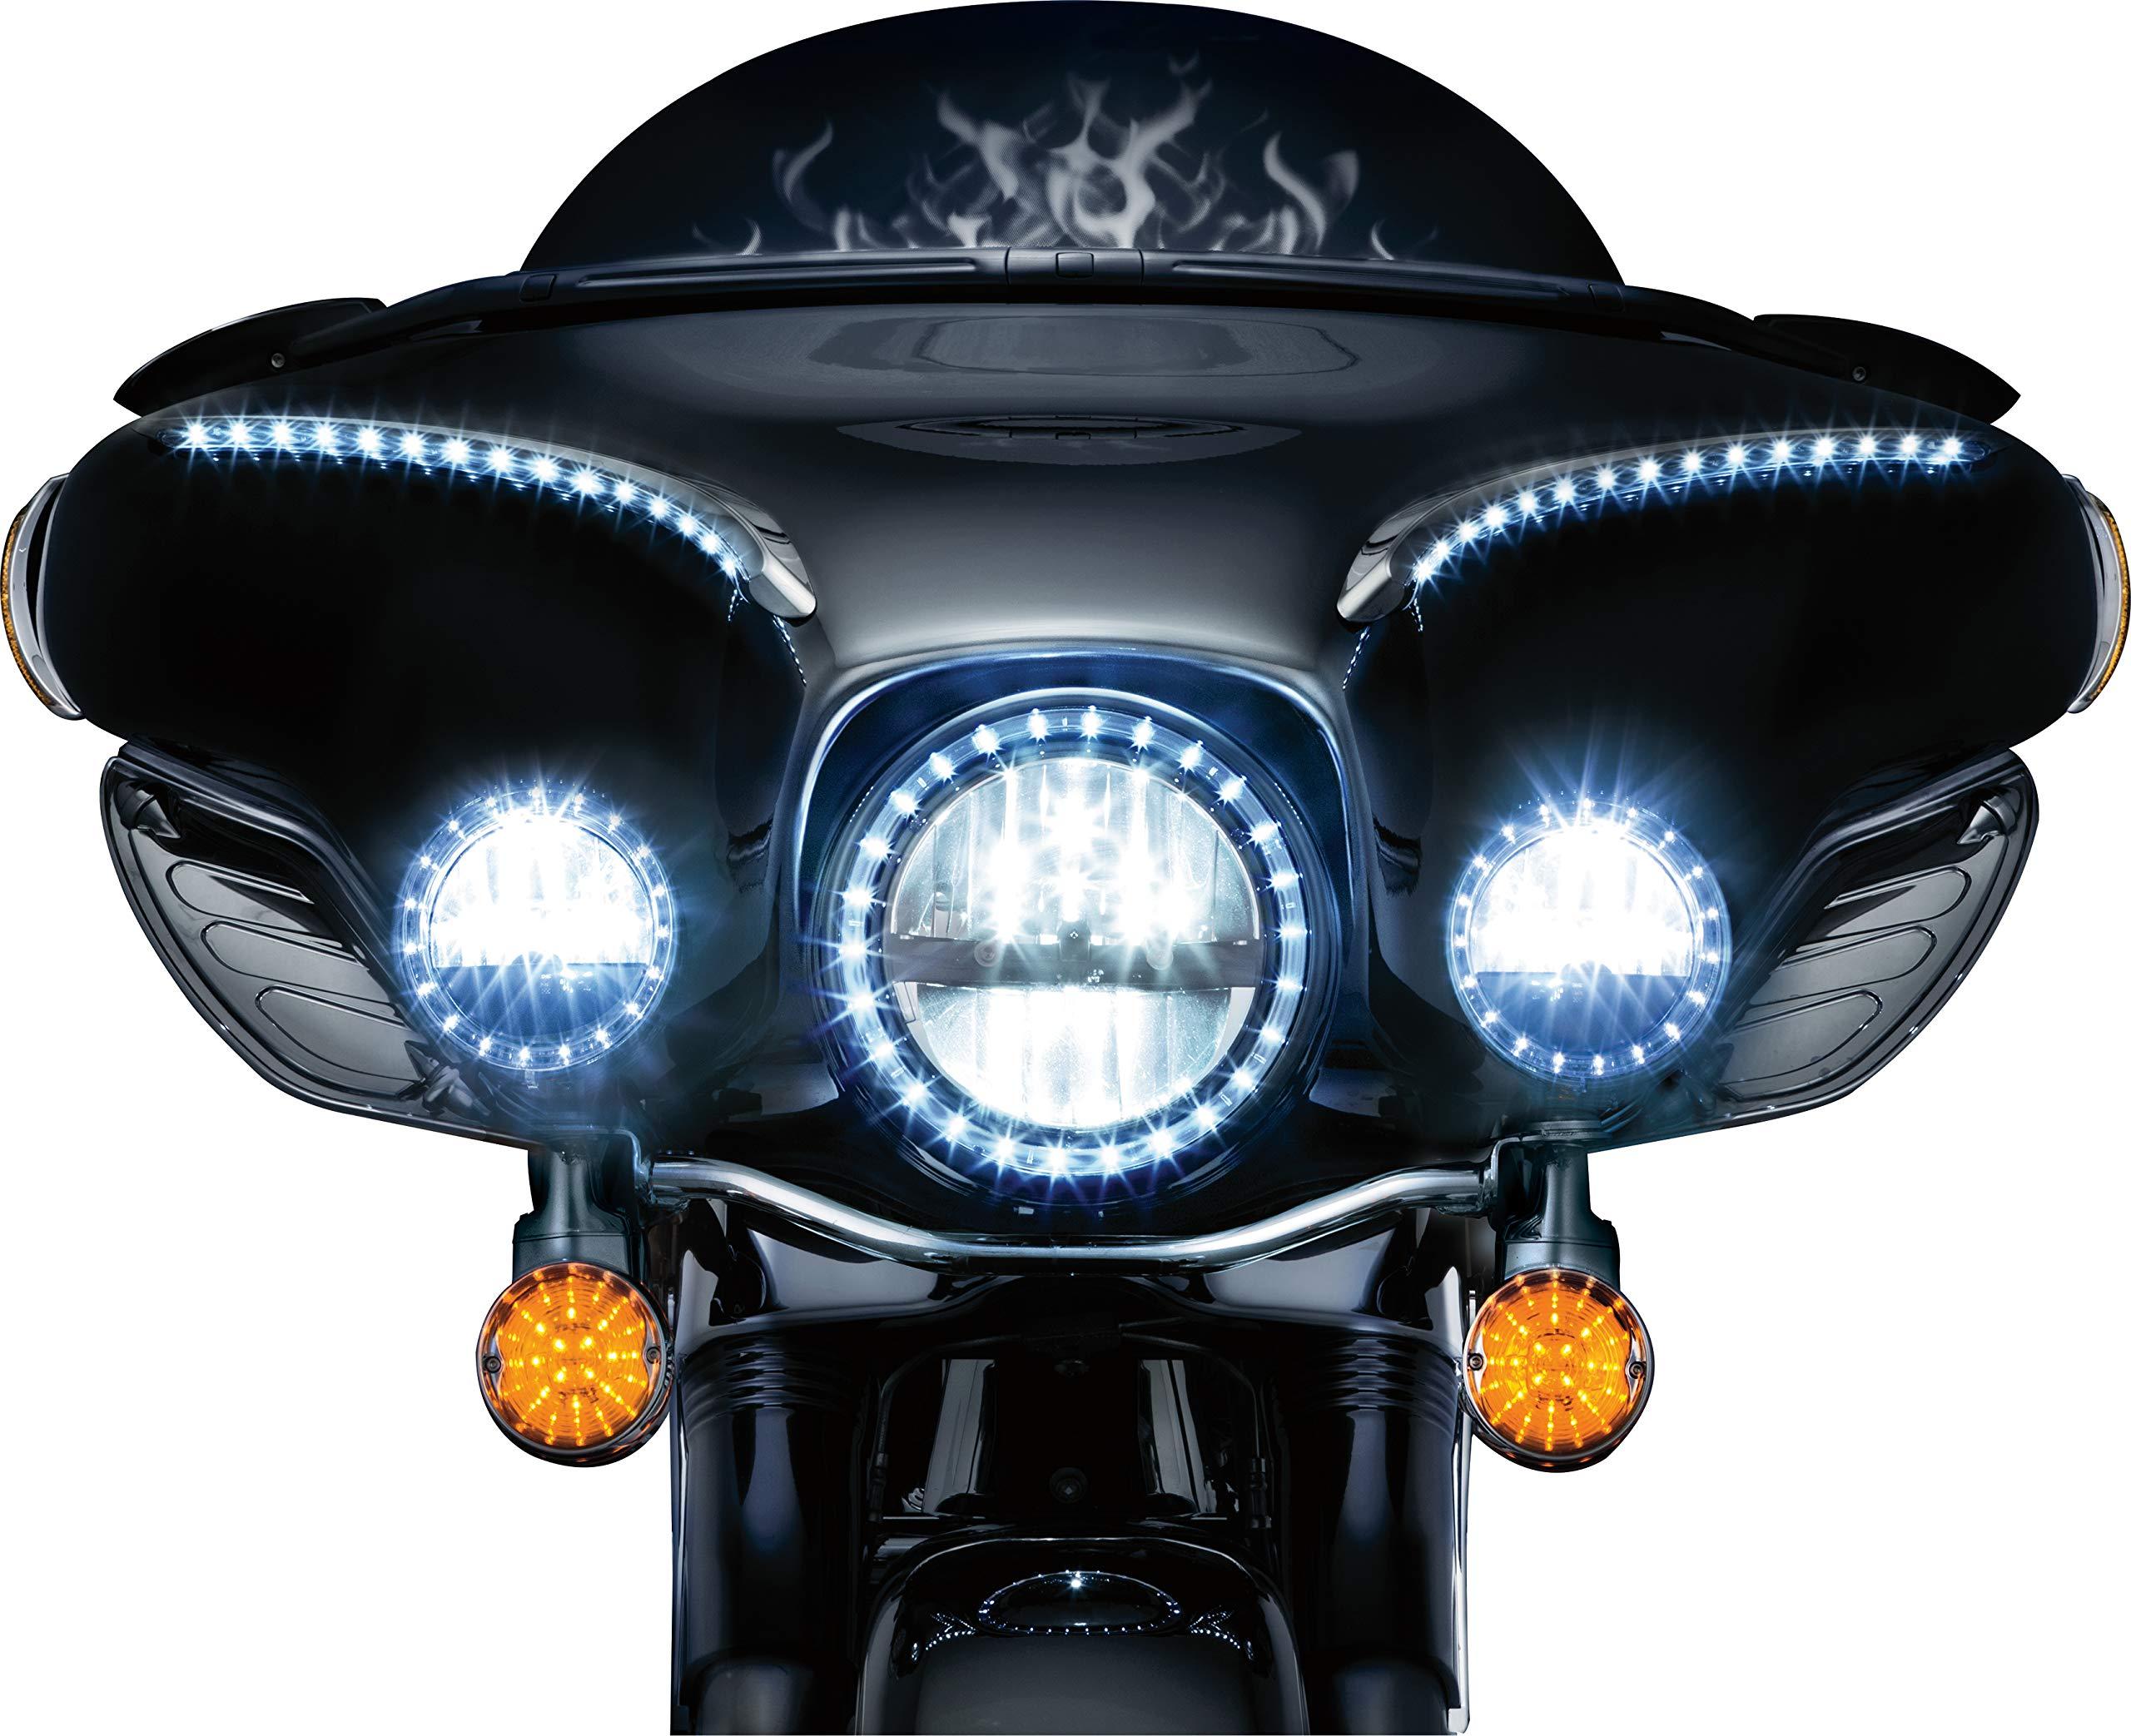 Kuryakyn 5440 Motorcycle Lighting: Flat Style LED Front Turn Signal Conversion Inserts, Dual Circuit for 1994-2019 Harley-Davidson Motorcycles, Amber Lenses, 1 Pair